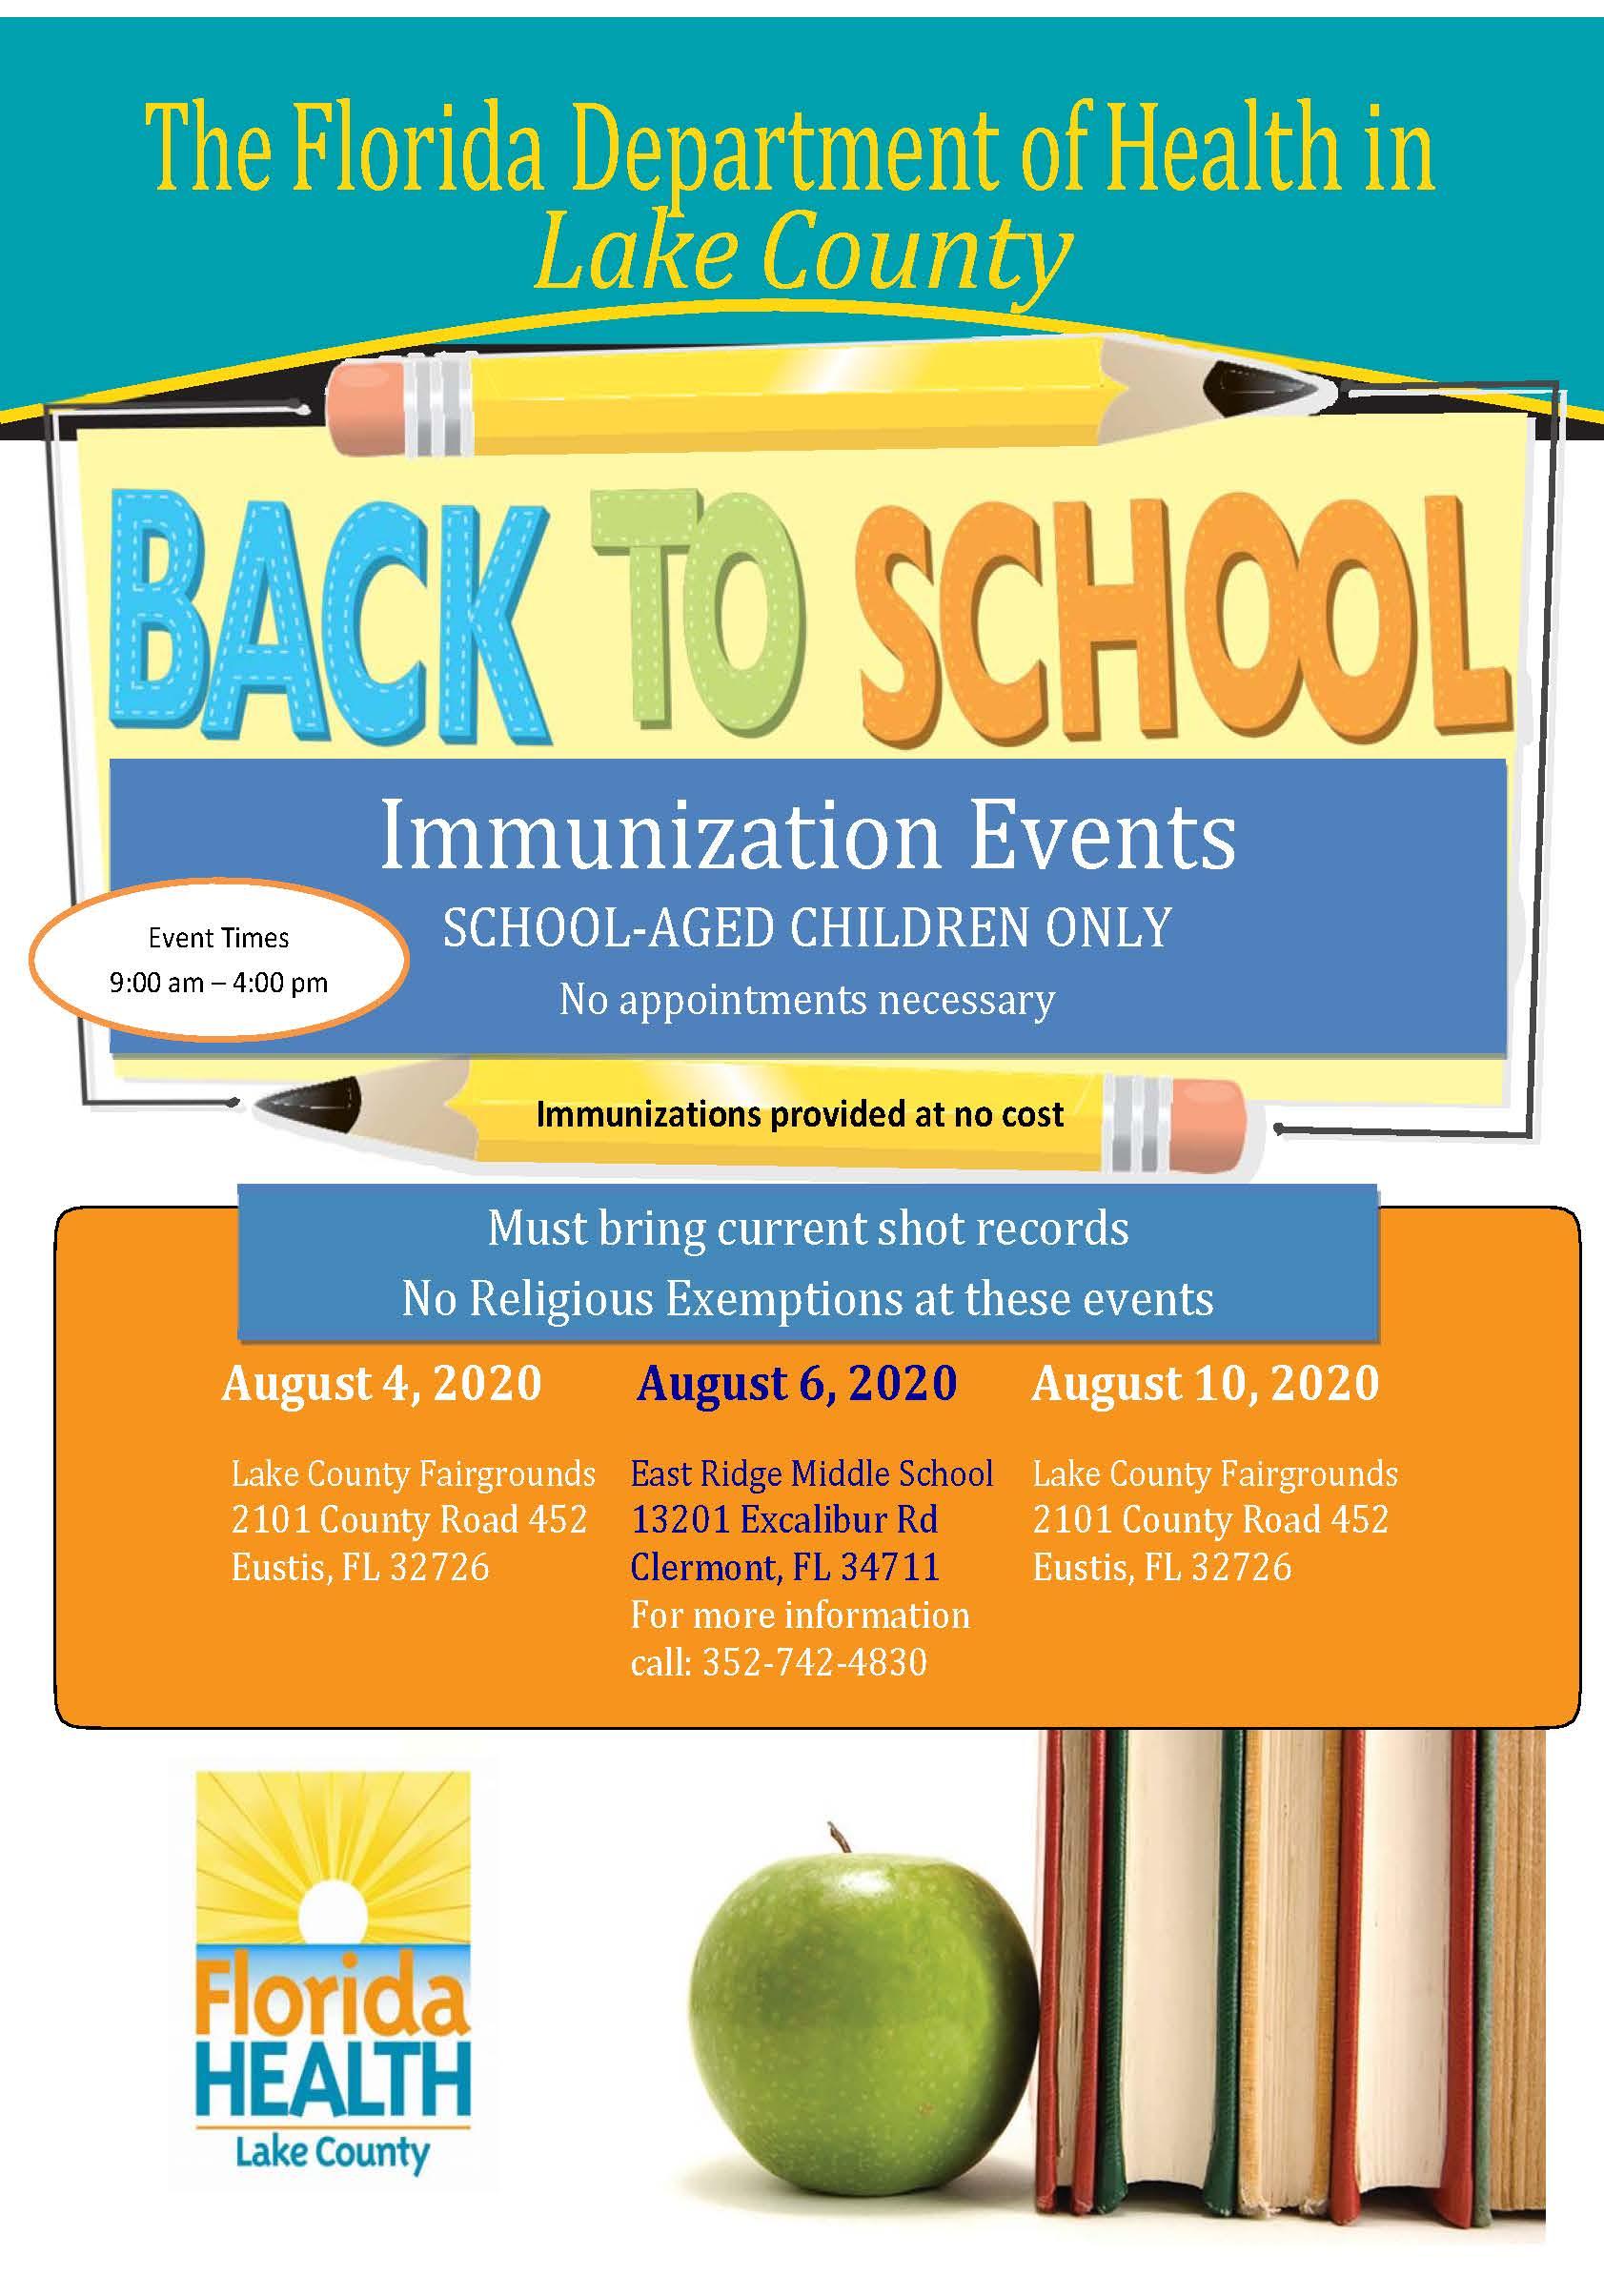 BACK TO SCHOOL IMMUNIZATION EVENT